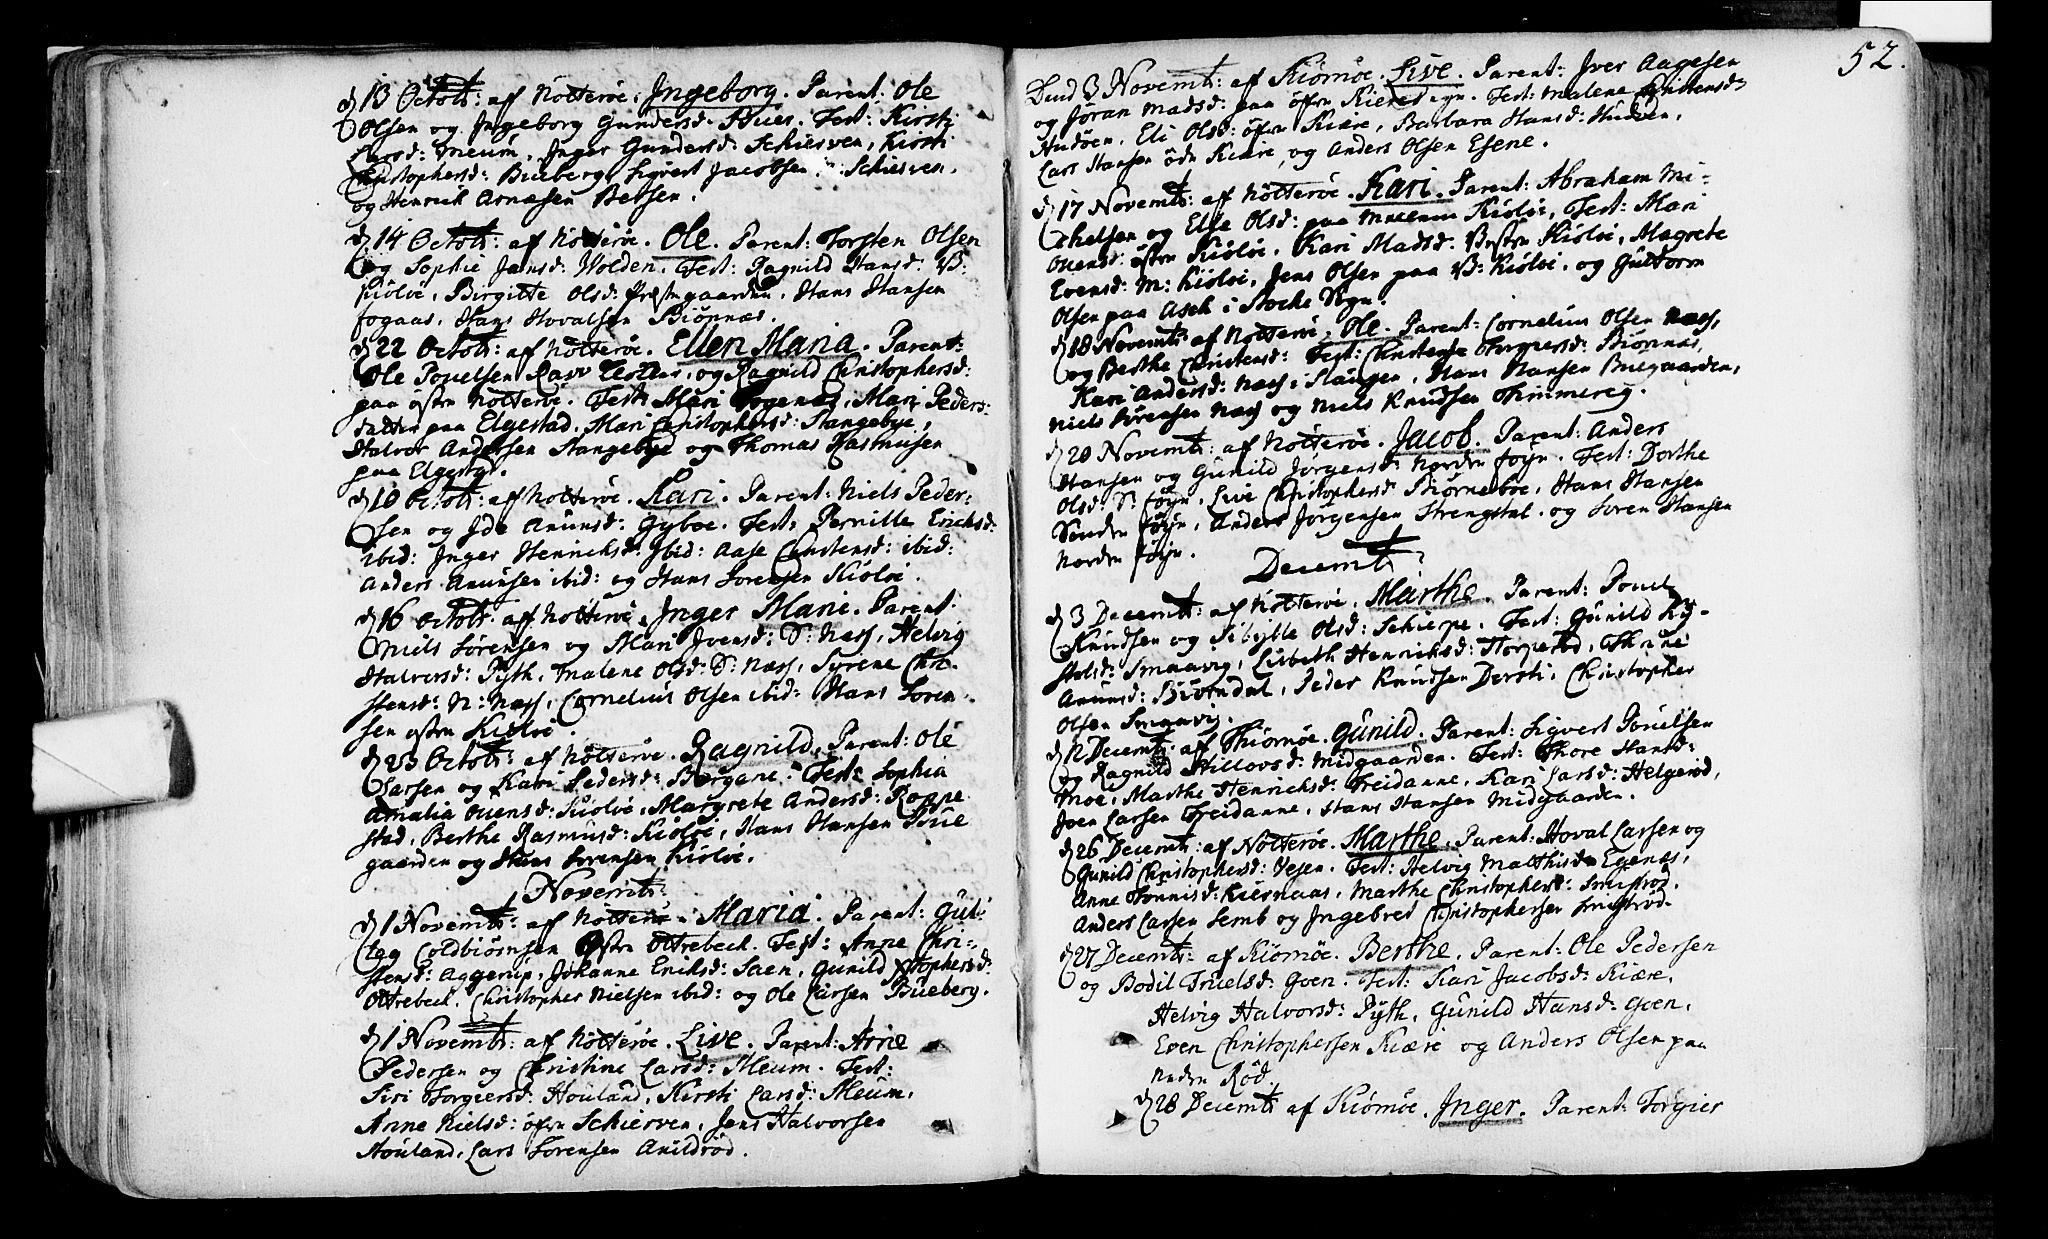 SAKO, Nøtterøy kirkebøker, F/Fa/L0002: Ministerialbok nr. I 2, 1738-1790, s. 52